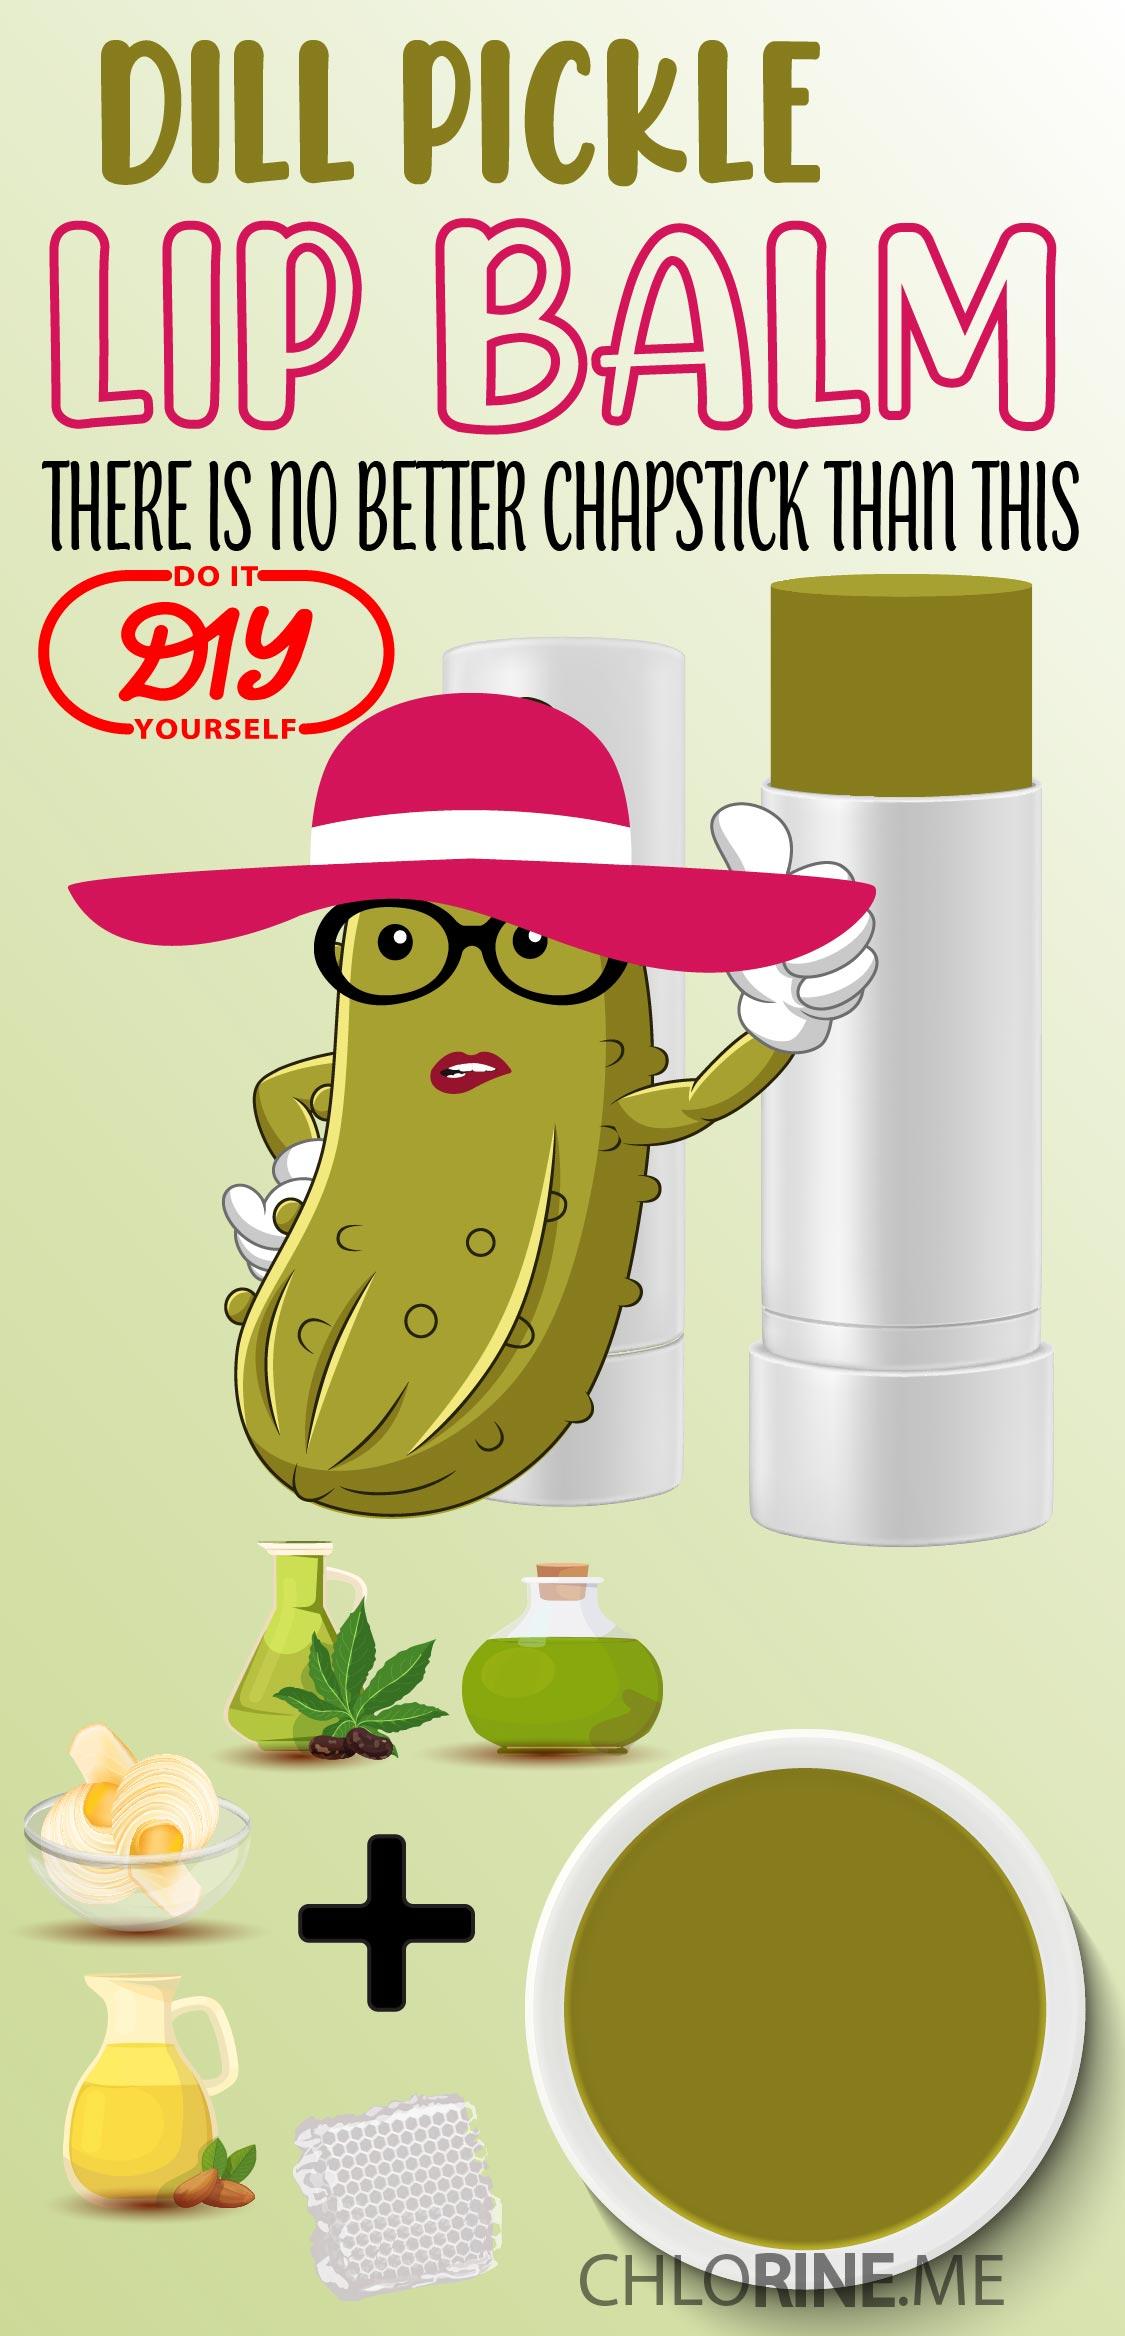 dill pickle lip balm chapstick